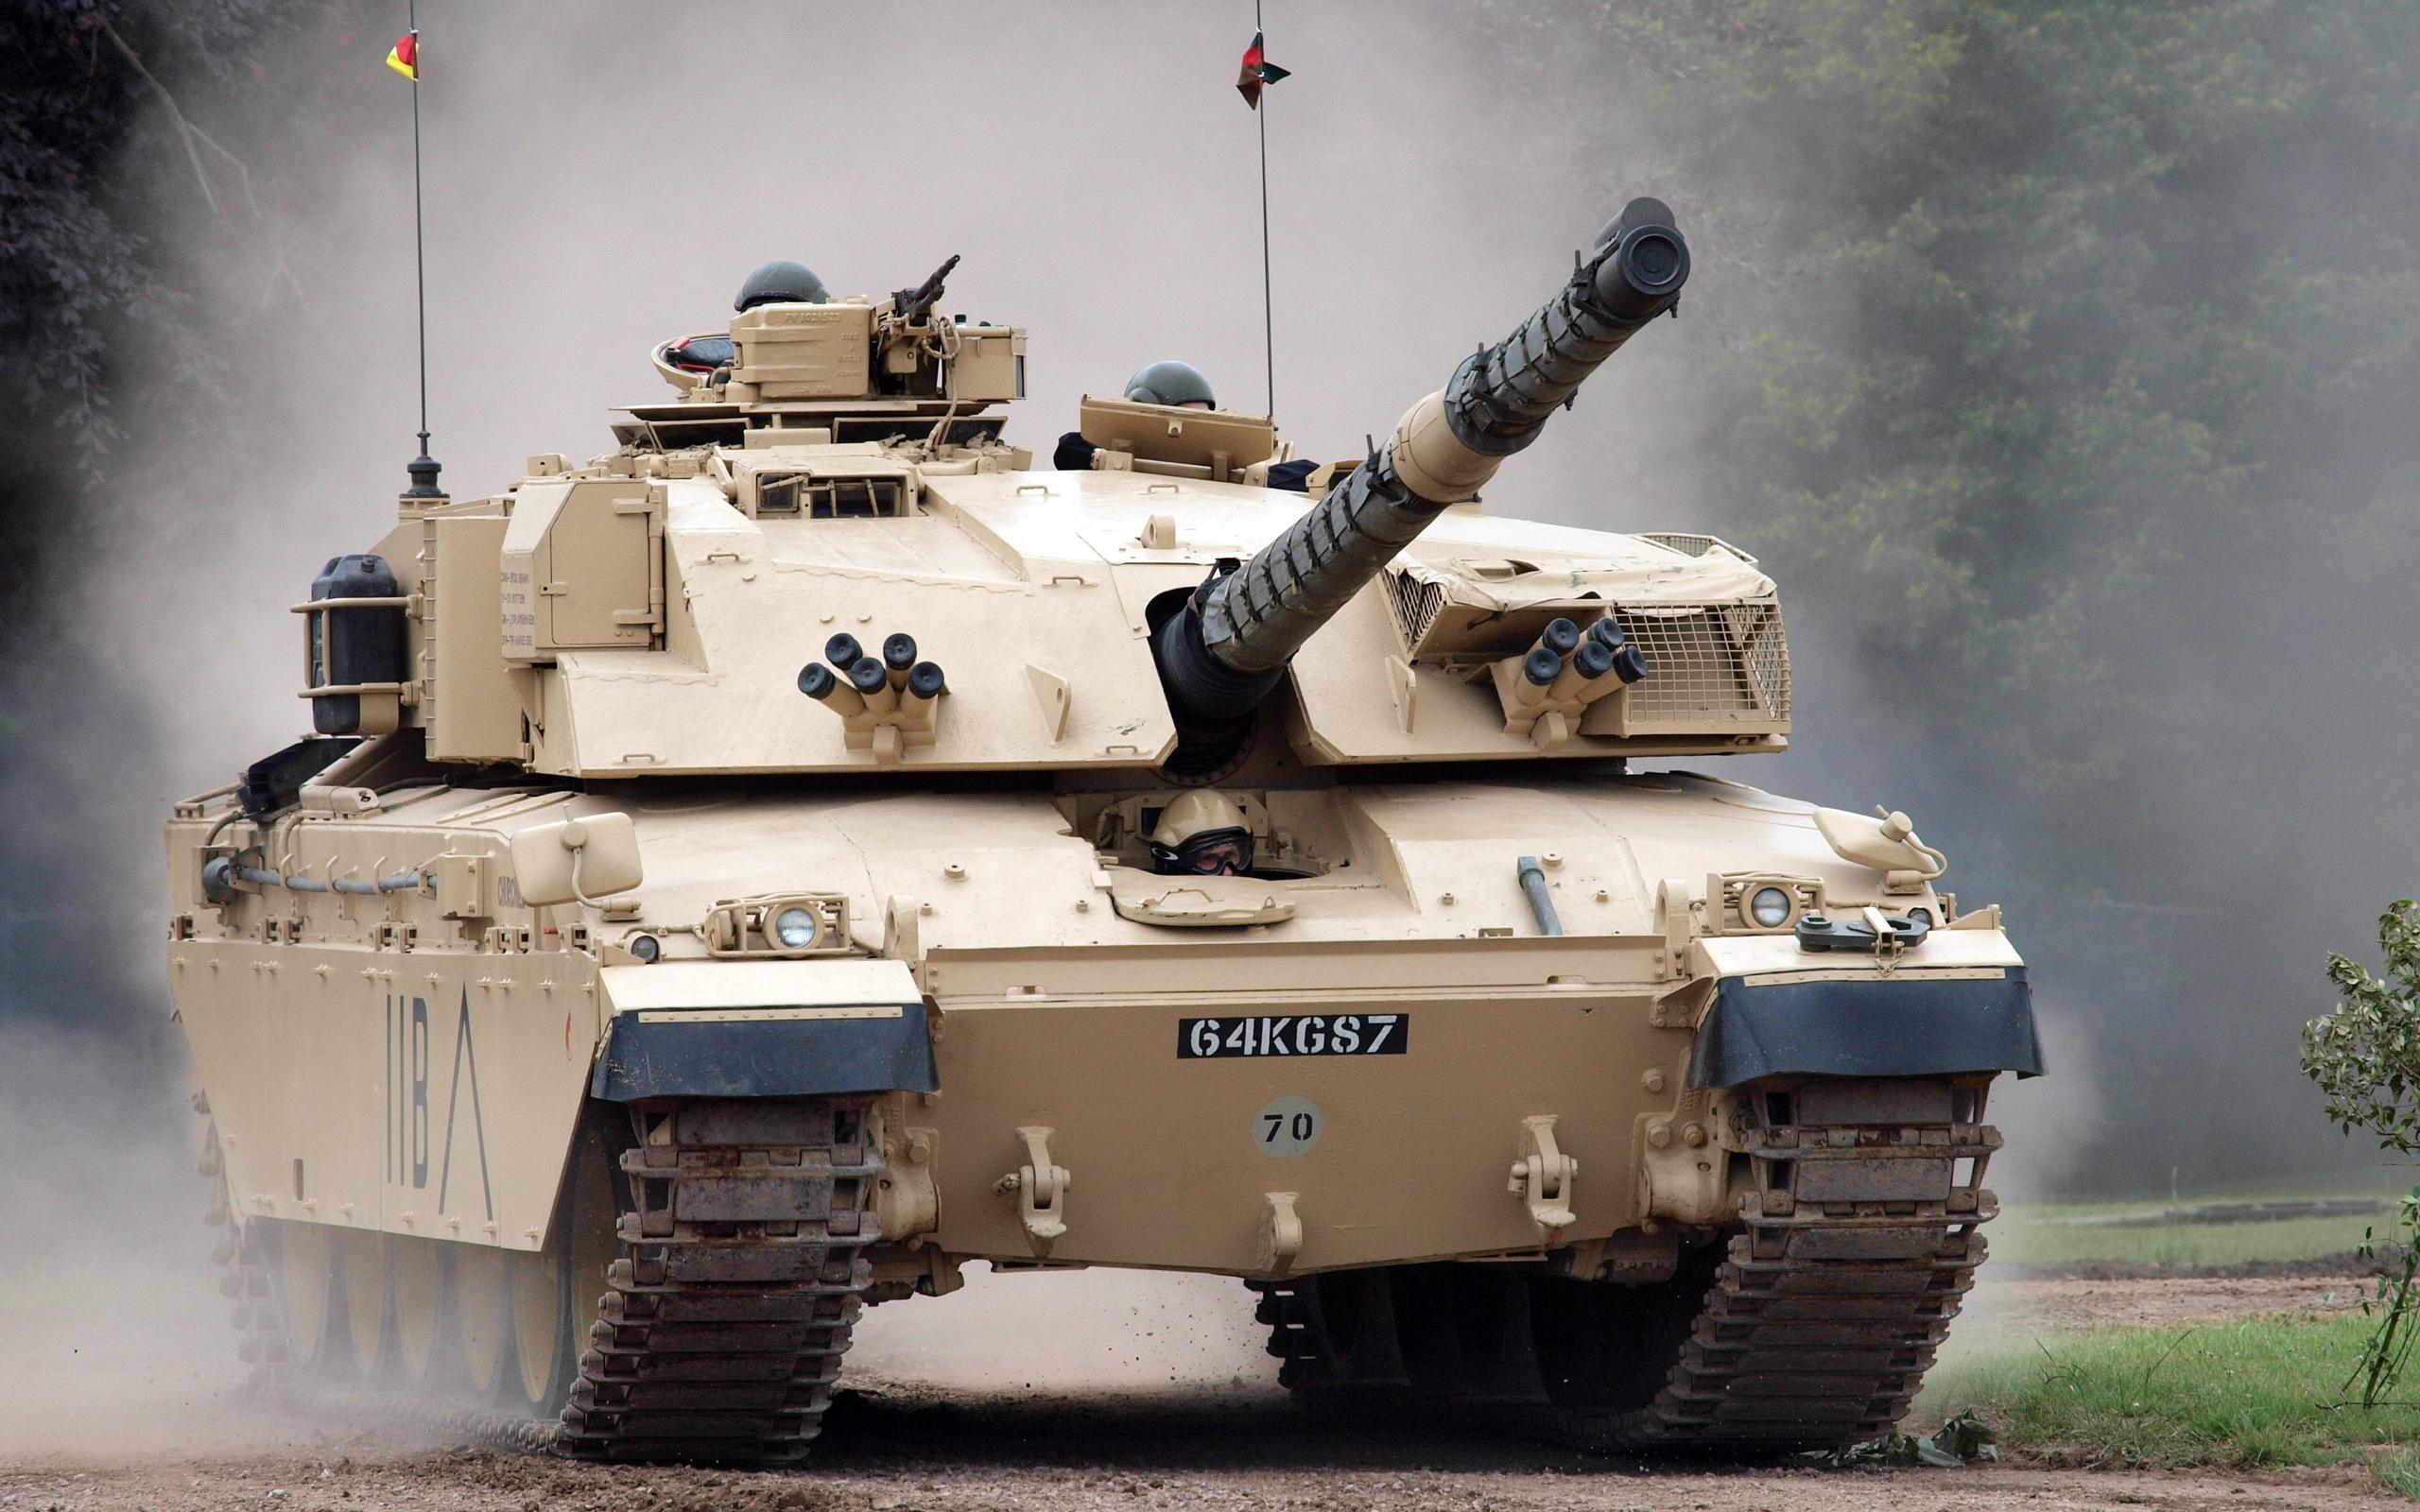 48+] Army Tank Wallpaper HD on WallpaperSafari